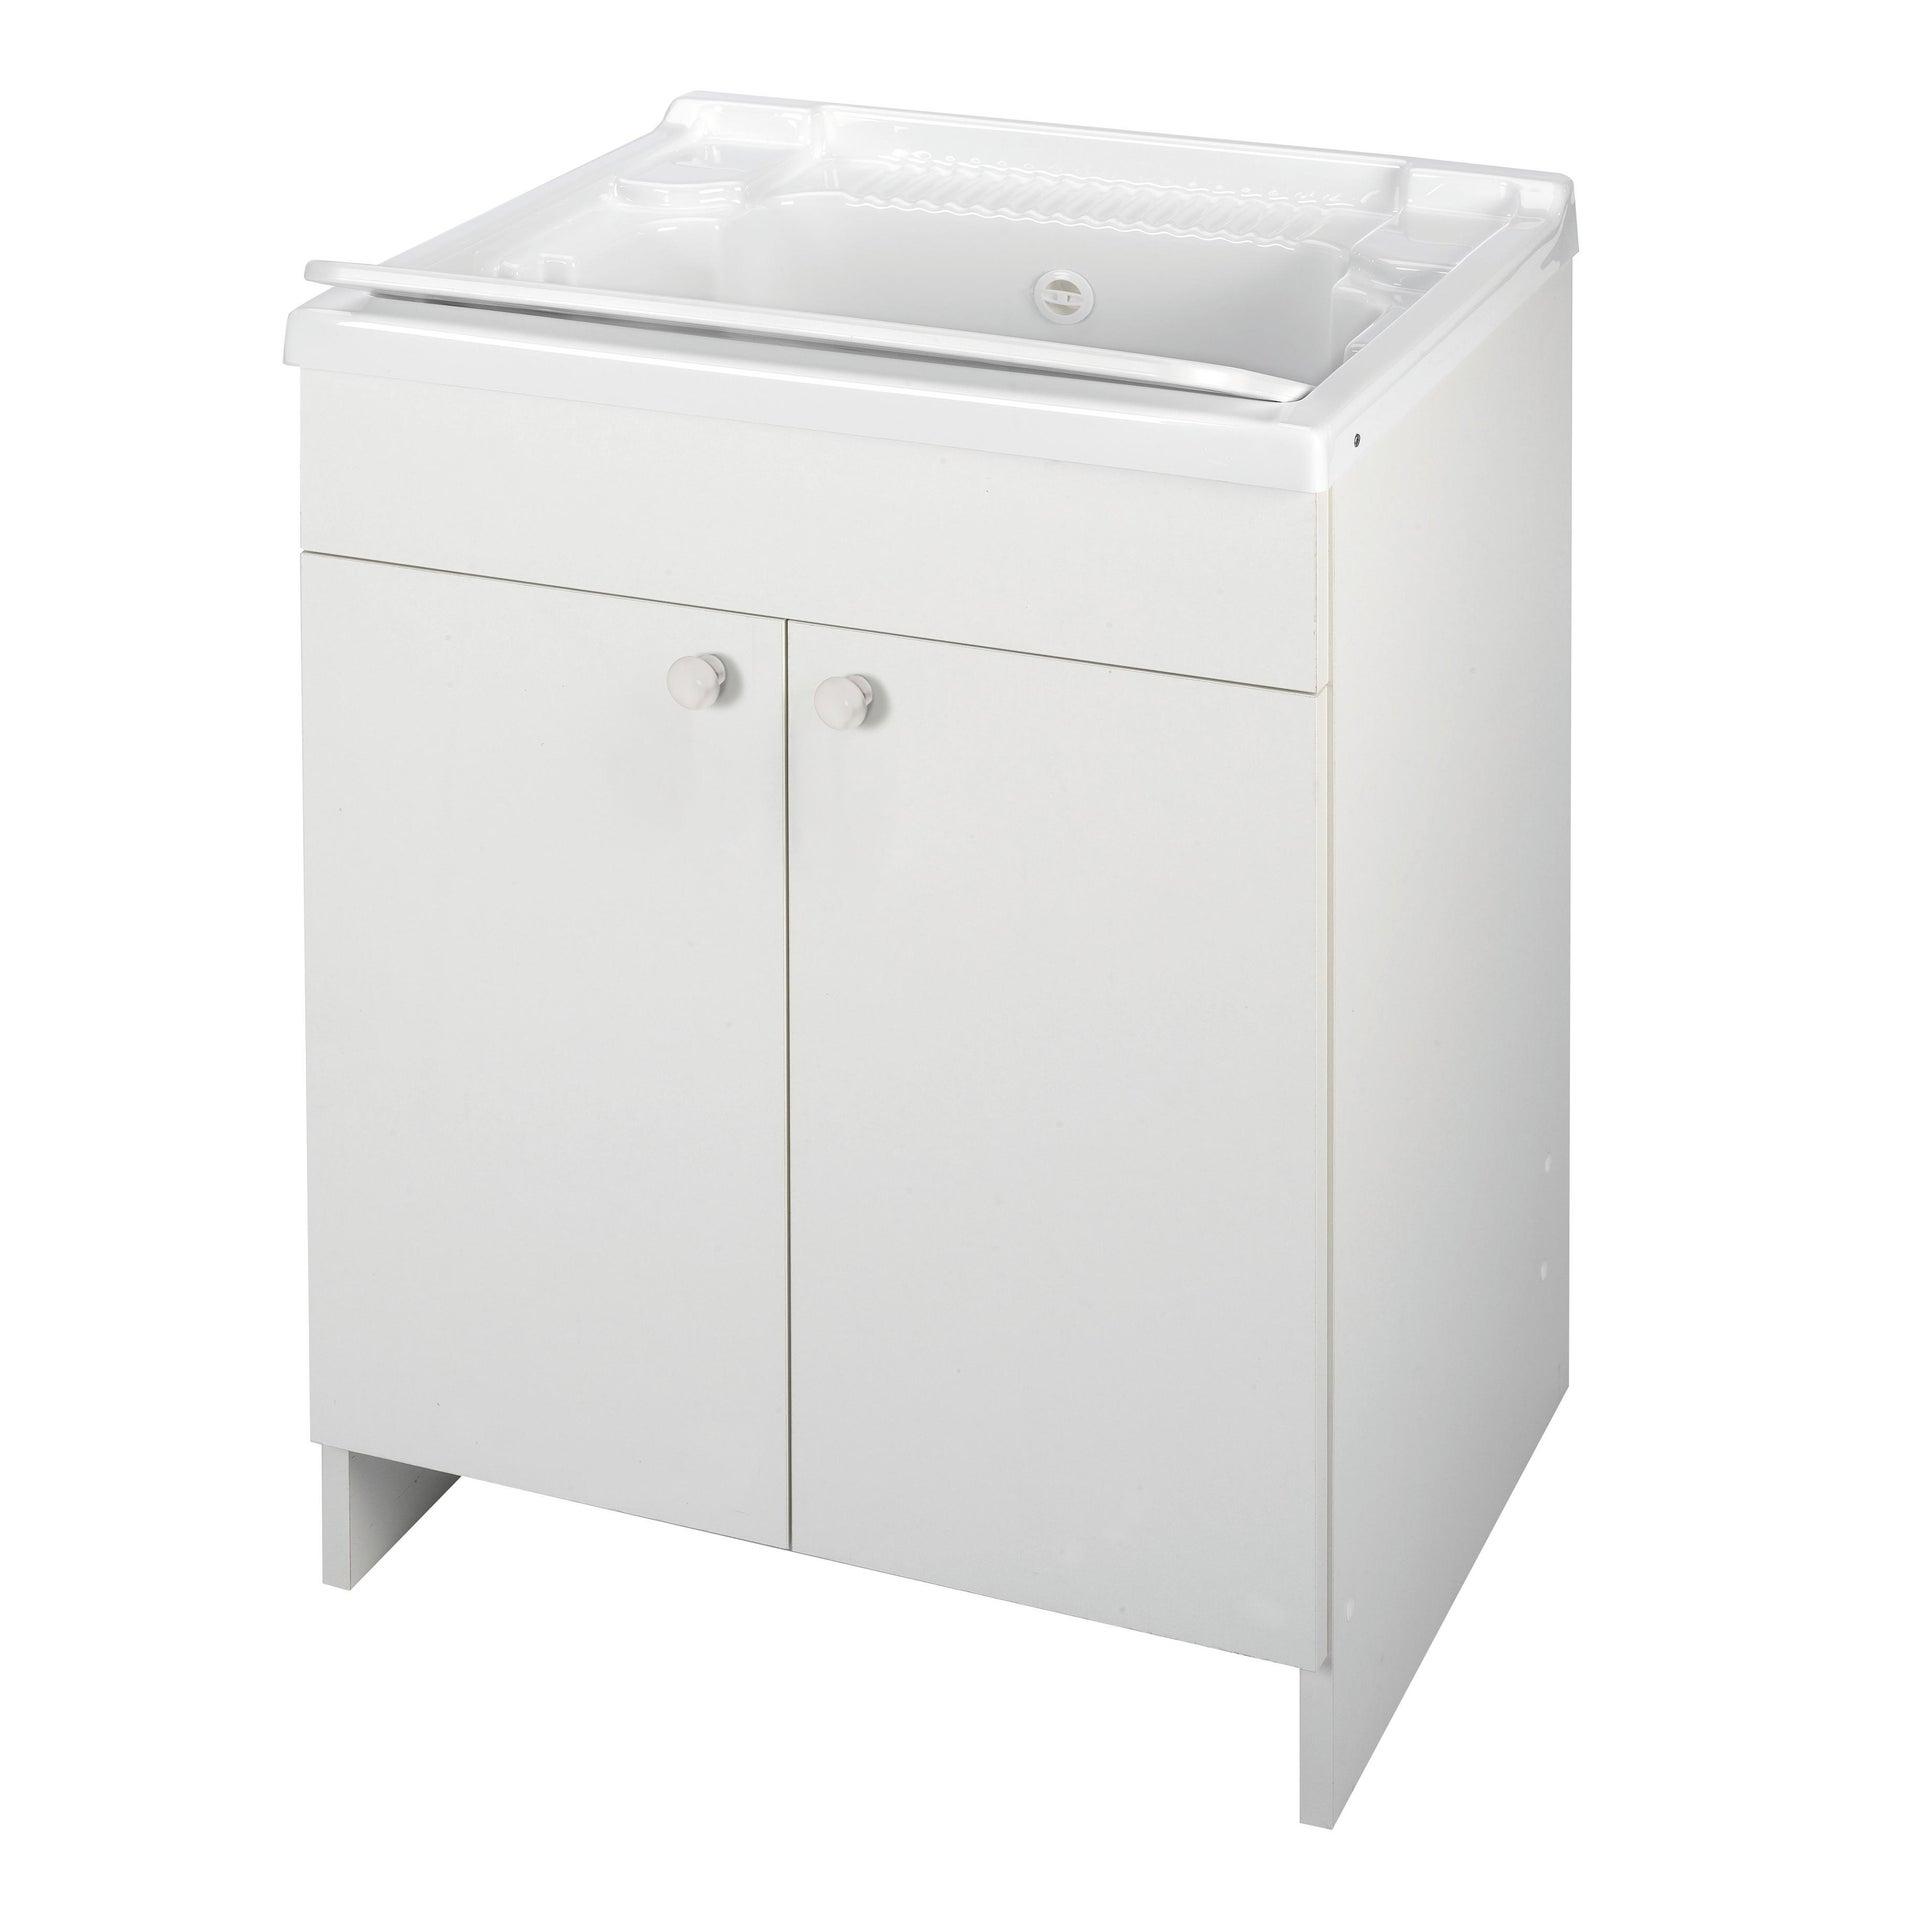 Mobile lavanderia Prix bianco L 59.2 x P 50.5 x H 84 cm - 4